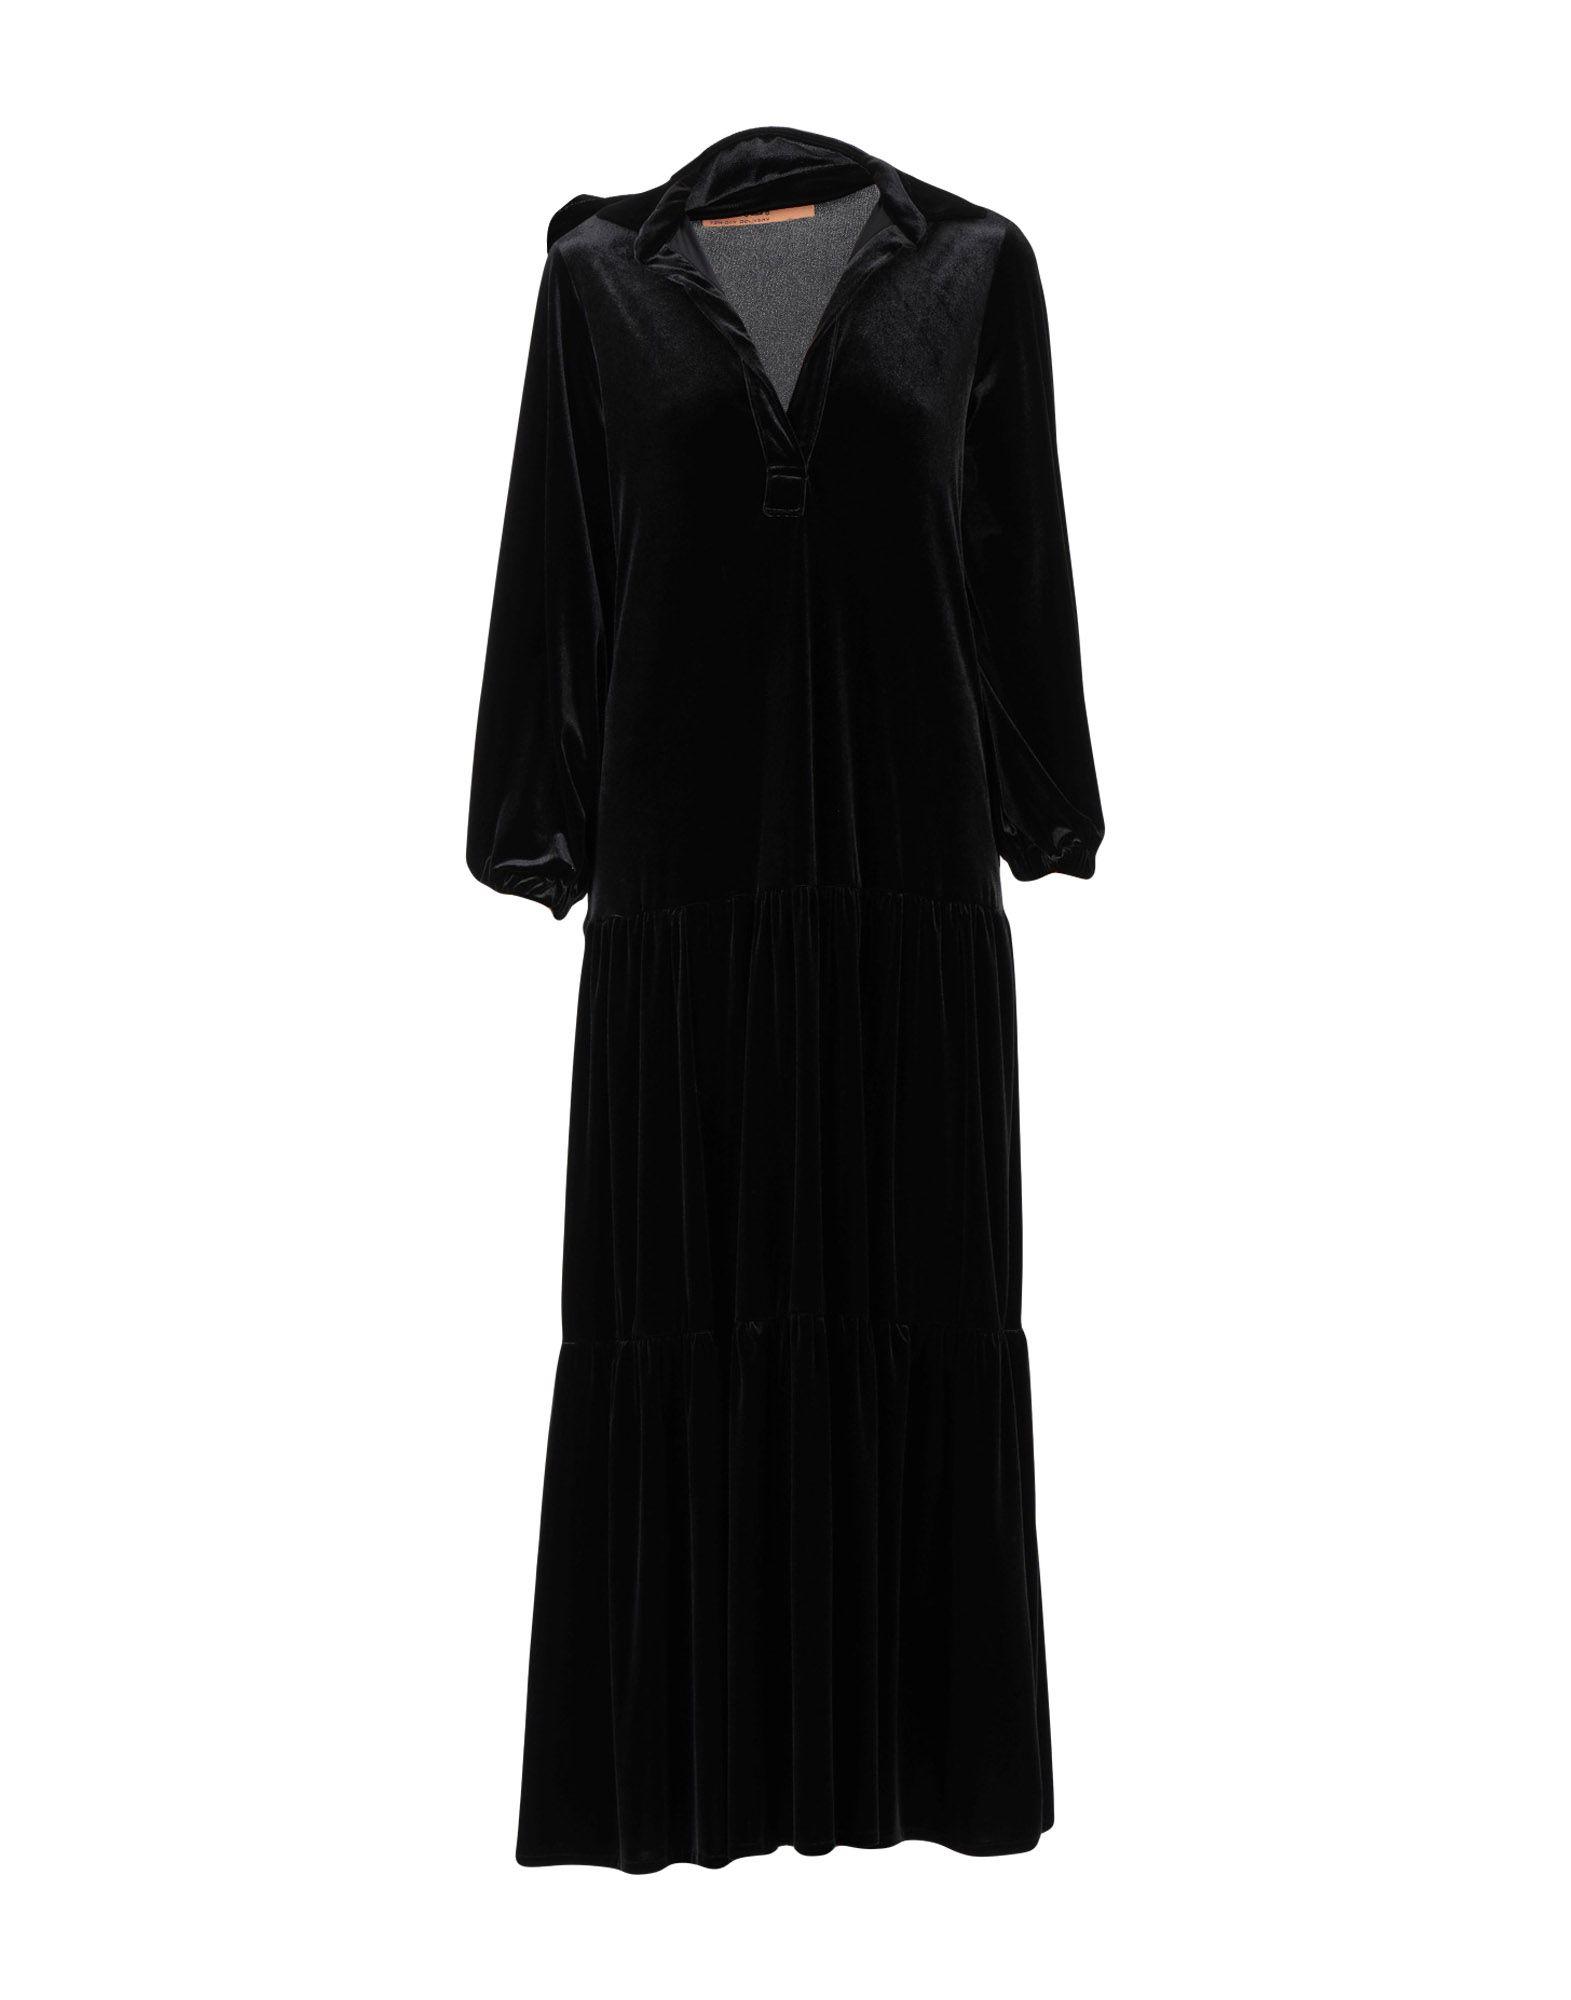 T.D.D. TEN-DAY DELIVERY Длинное платье